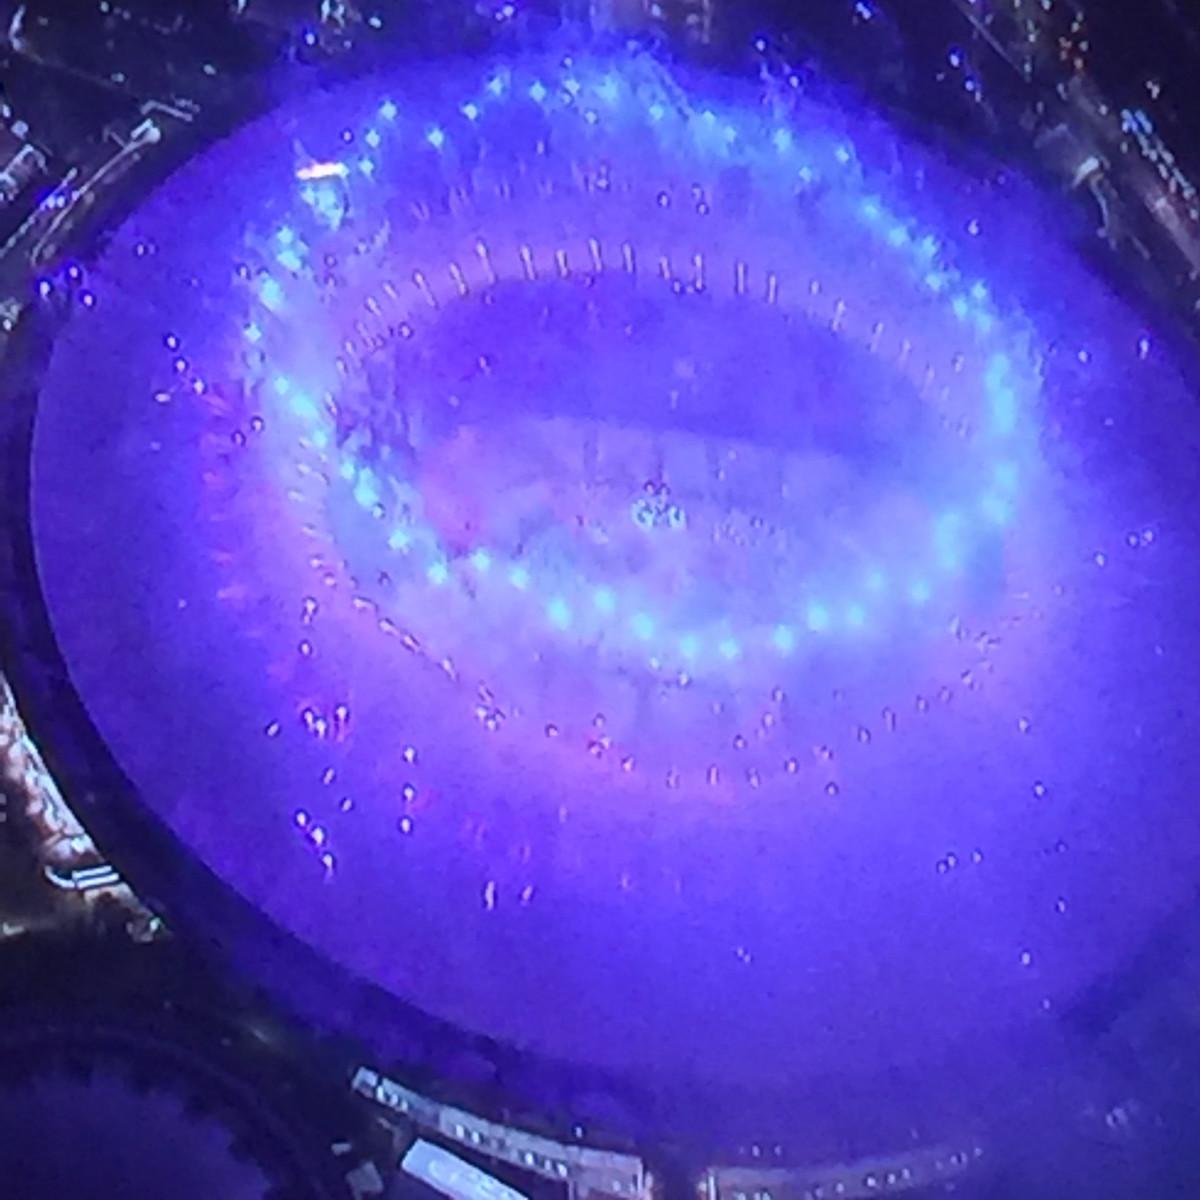 Stadium Lights Blue by Gina Godfrey